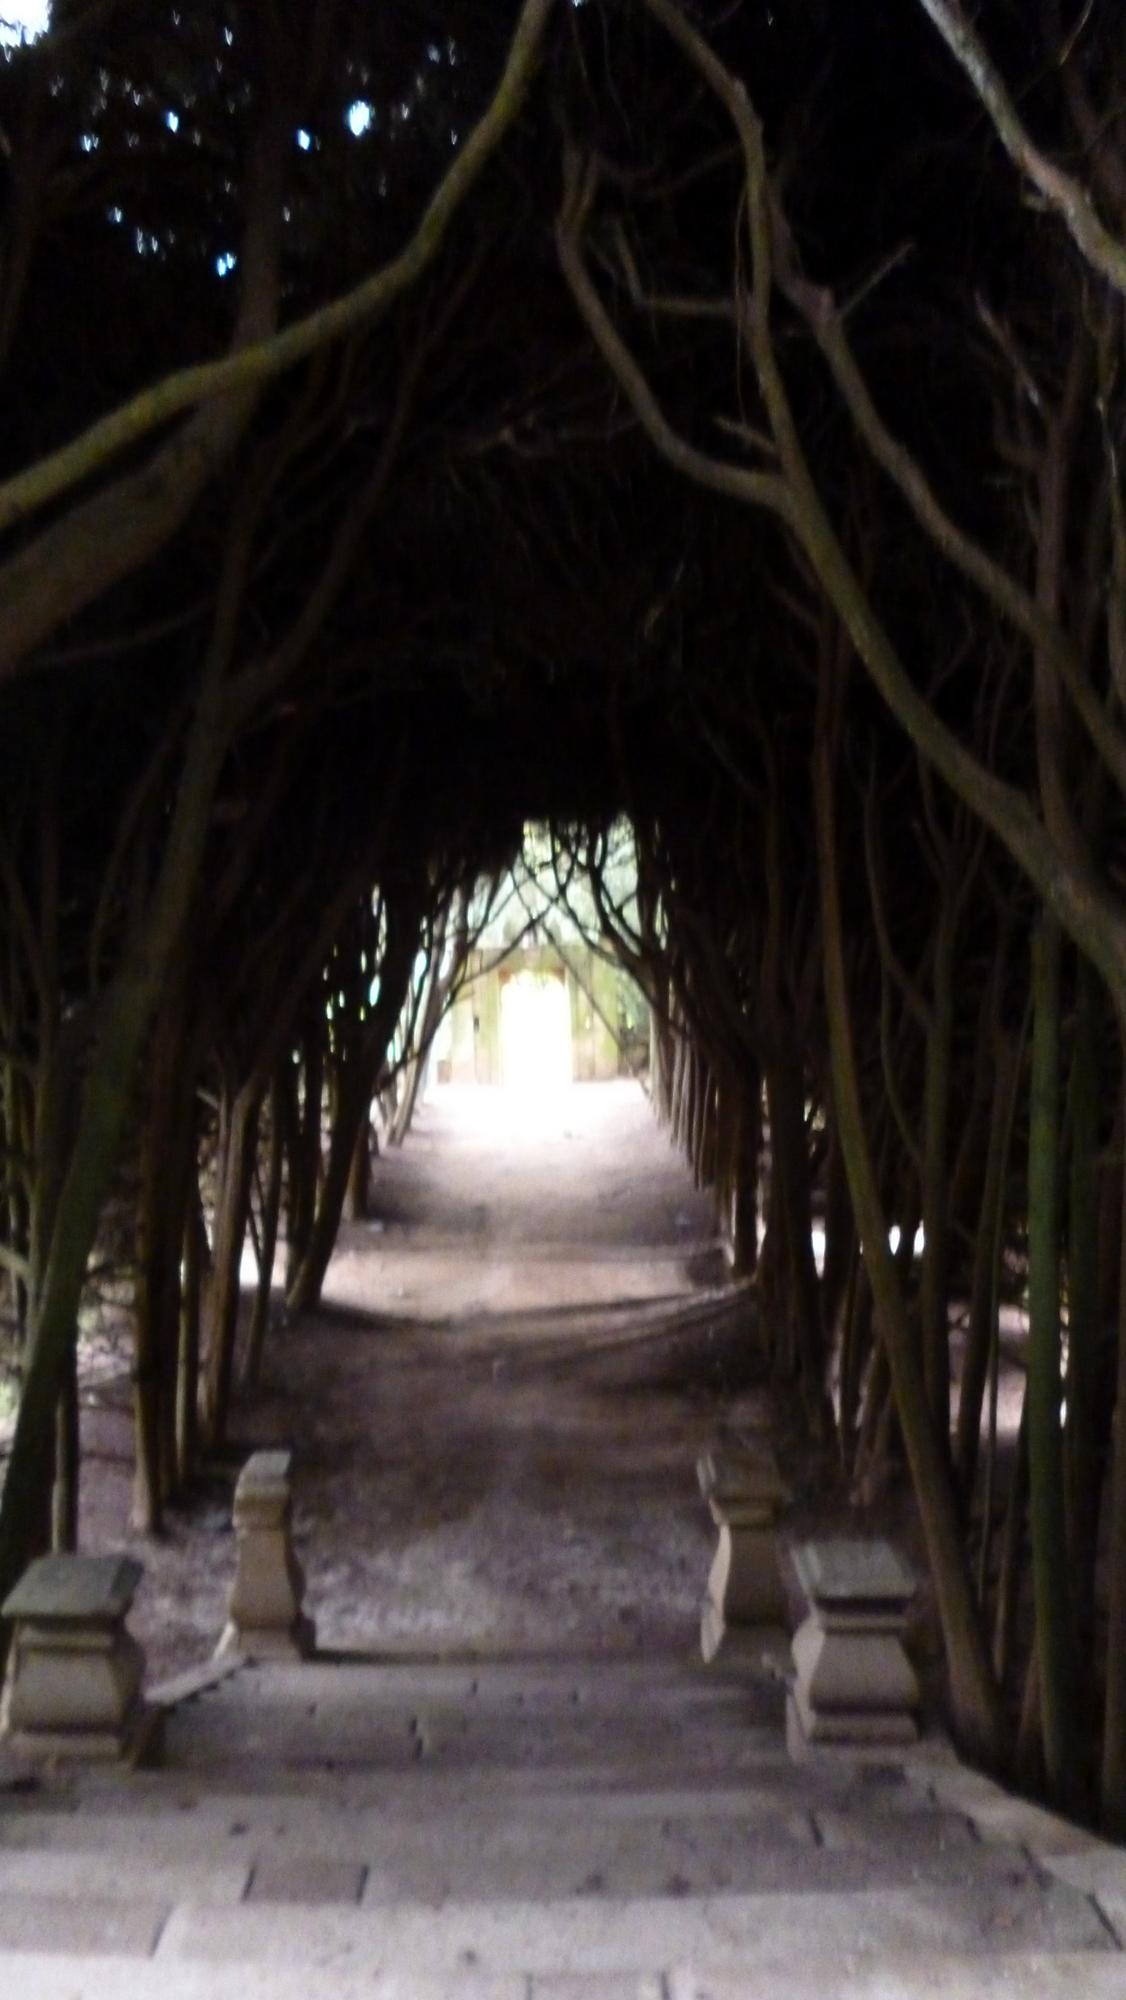 Tunel z cedrů v zahradách Casa de Mateus